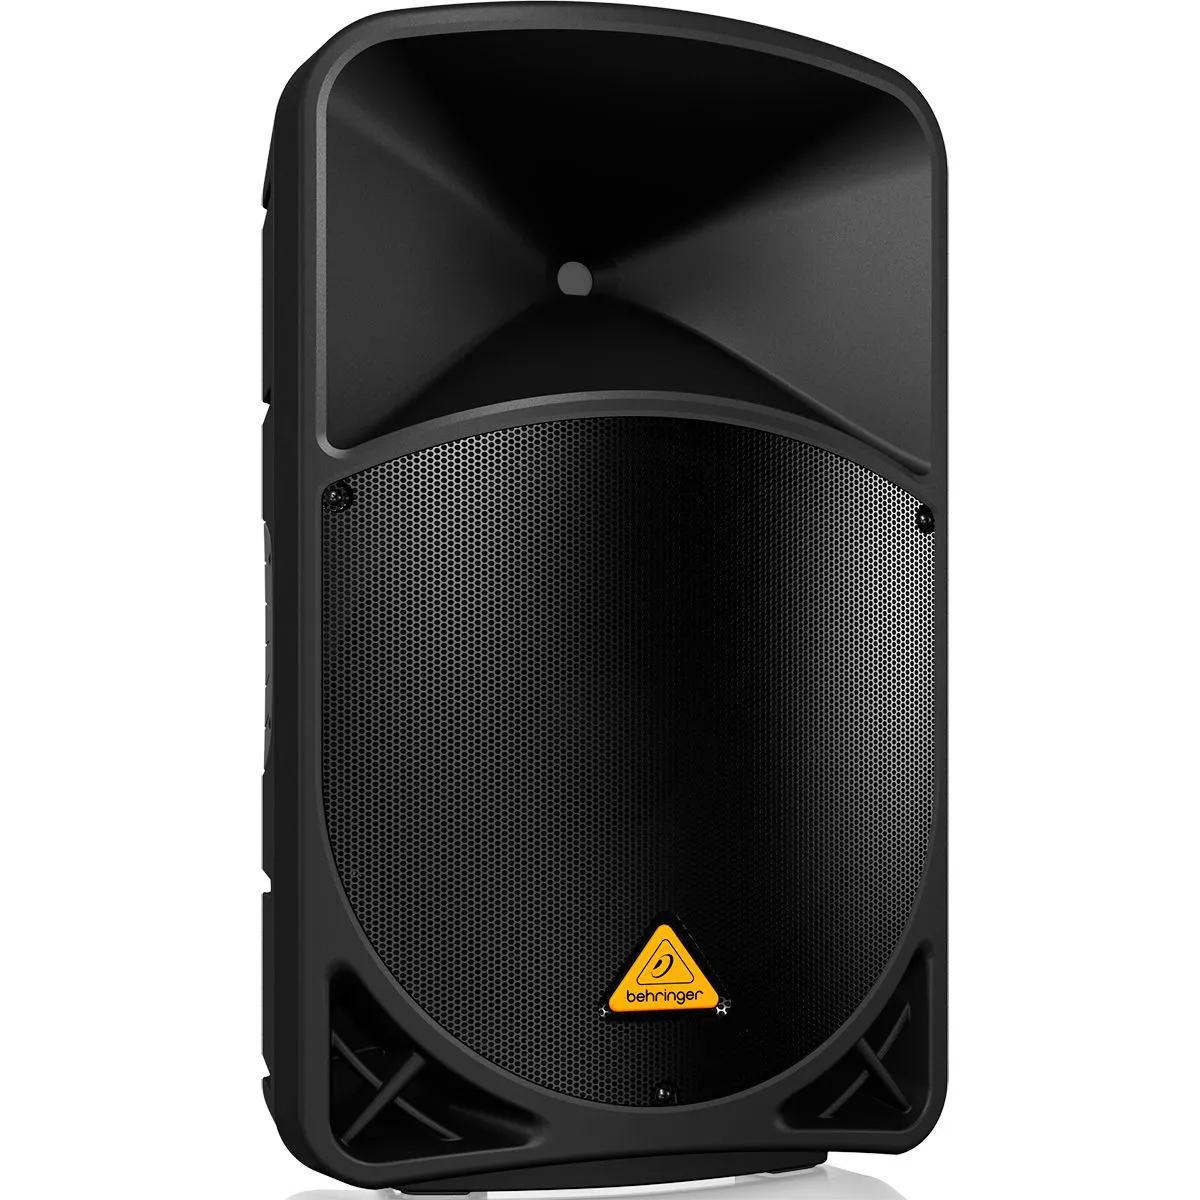 Caixa de Som Ativa Behringer B115MP3 1000W 220V